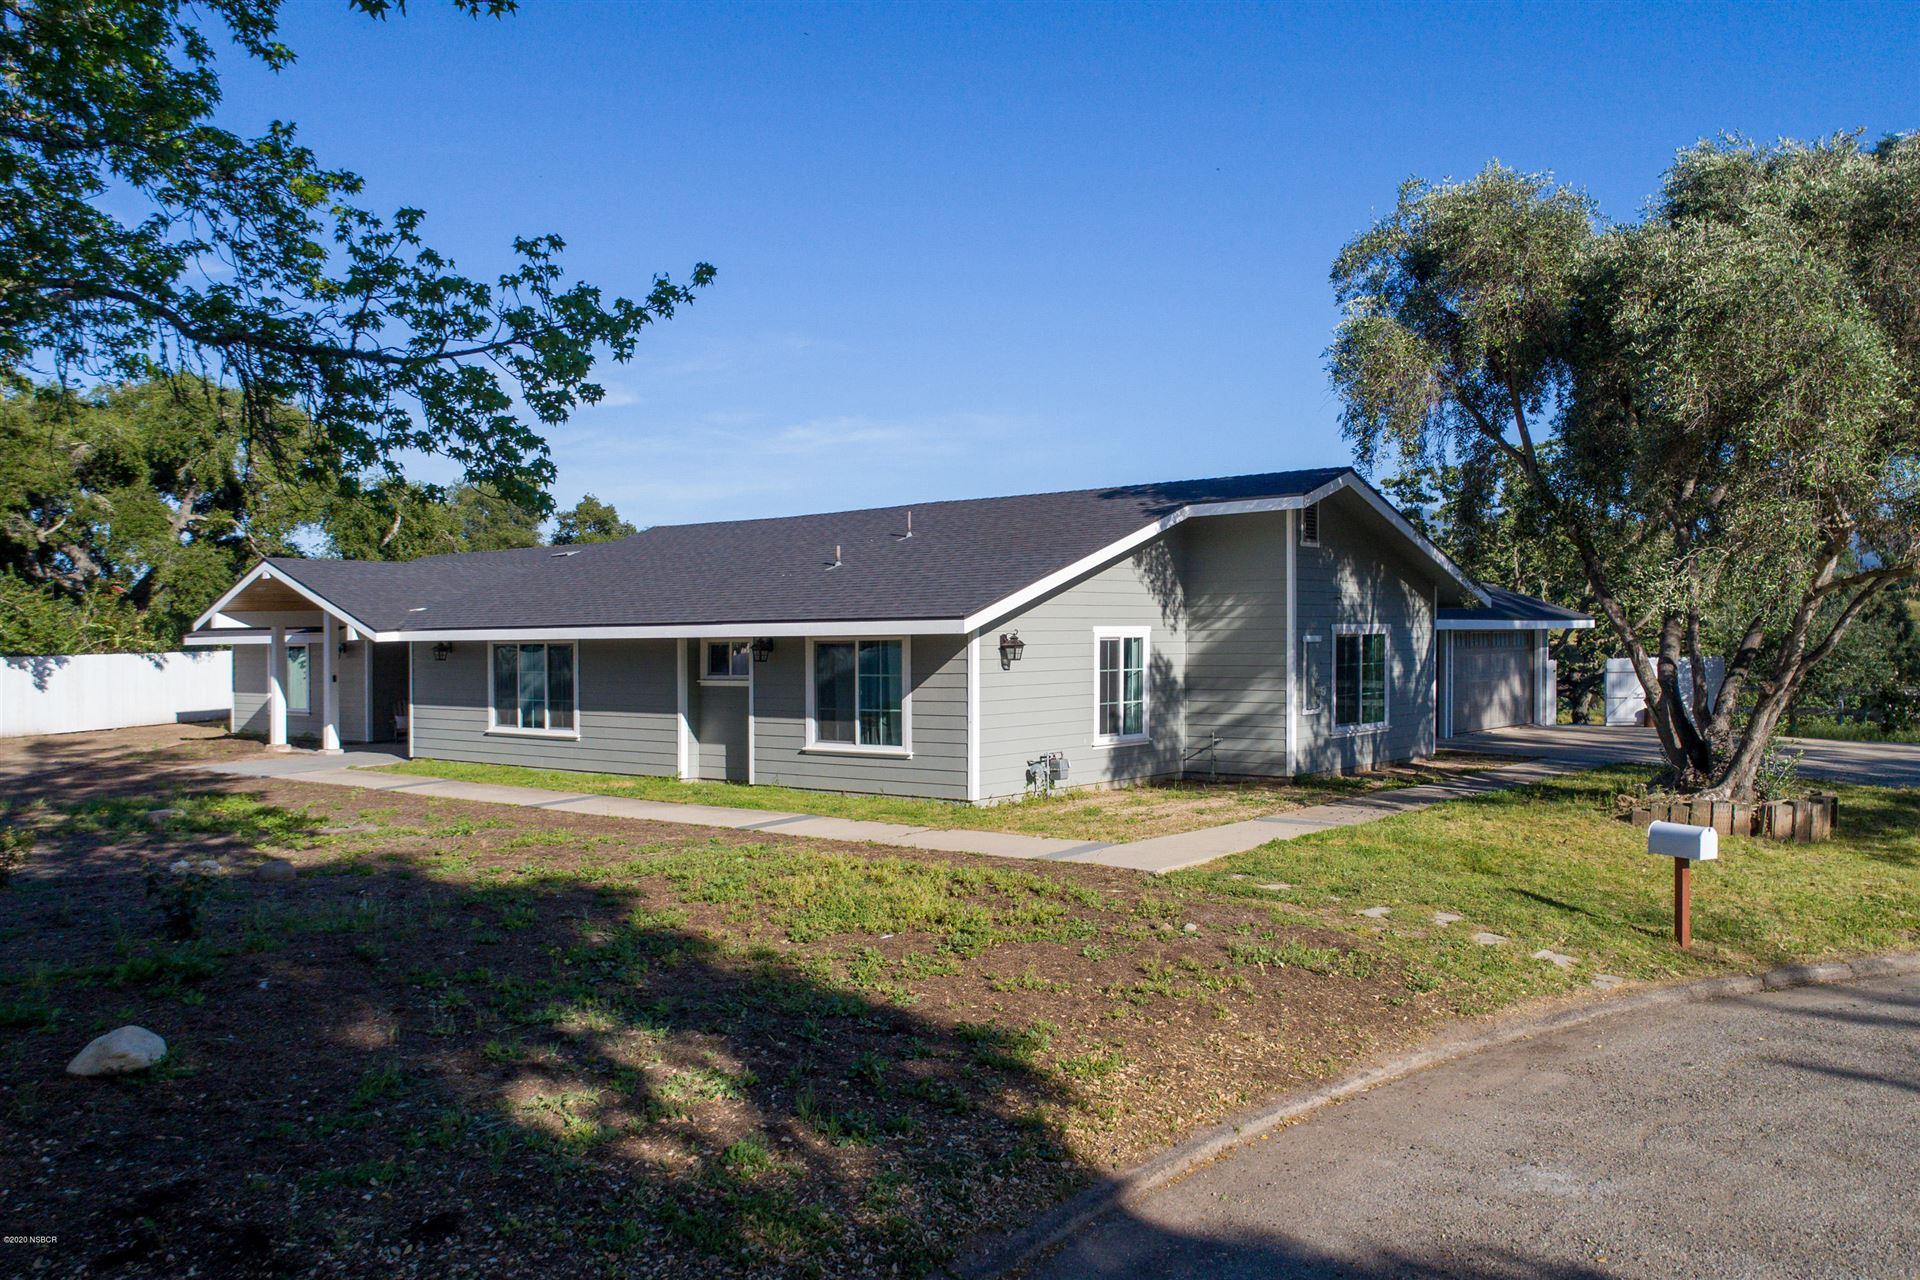 954 Elk Grove Lane, Solvang, CA 93463 - #: 20000954